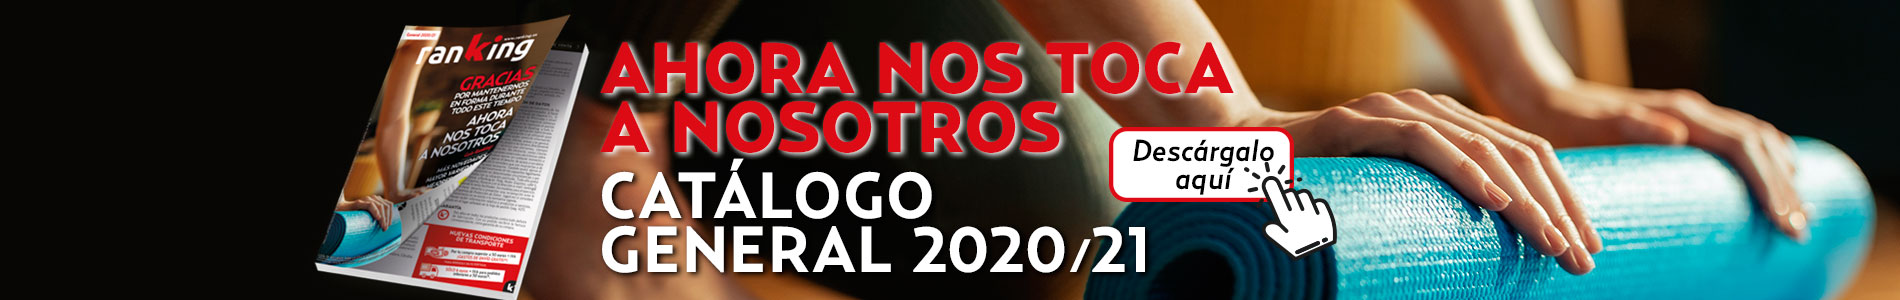 Catalogo General 2020/2021